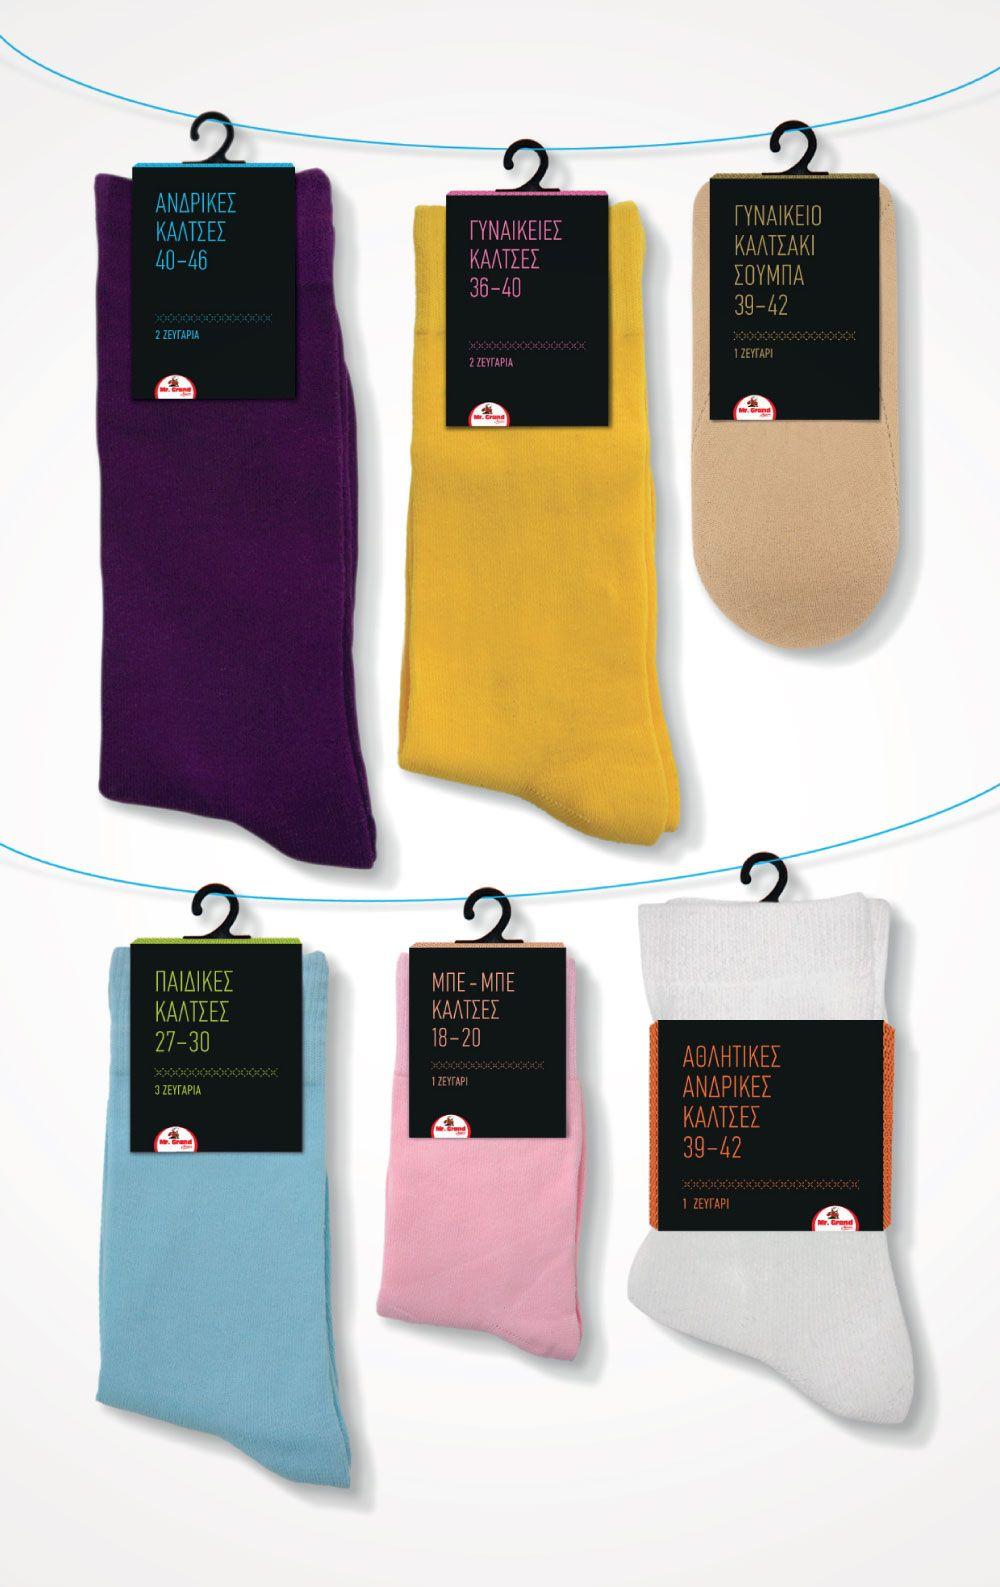 socks packaging google search packaging socks pinterest